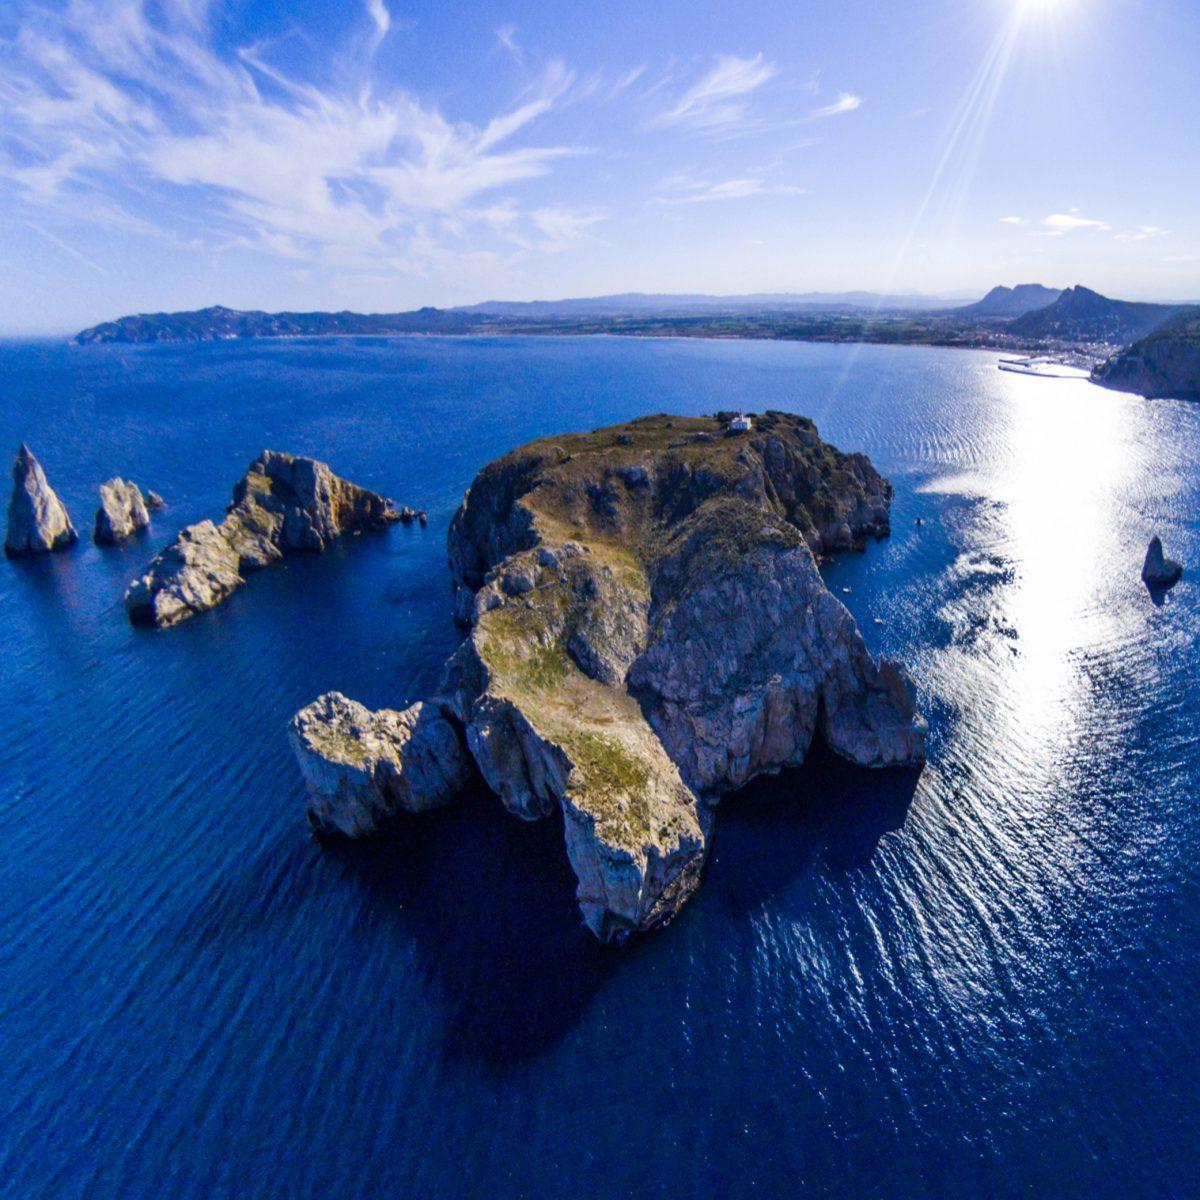 Aventura en Islas Medas BRAVE Divers On Tour